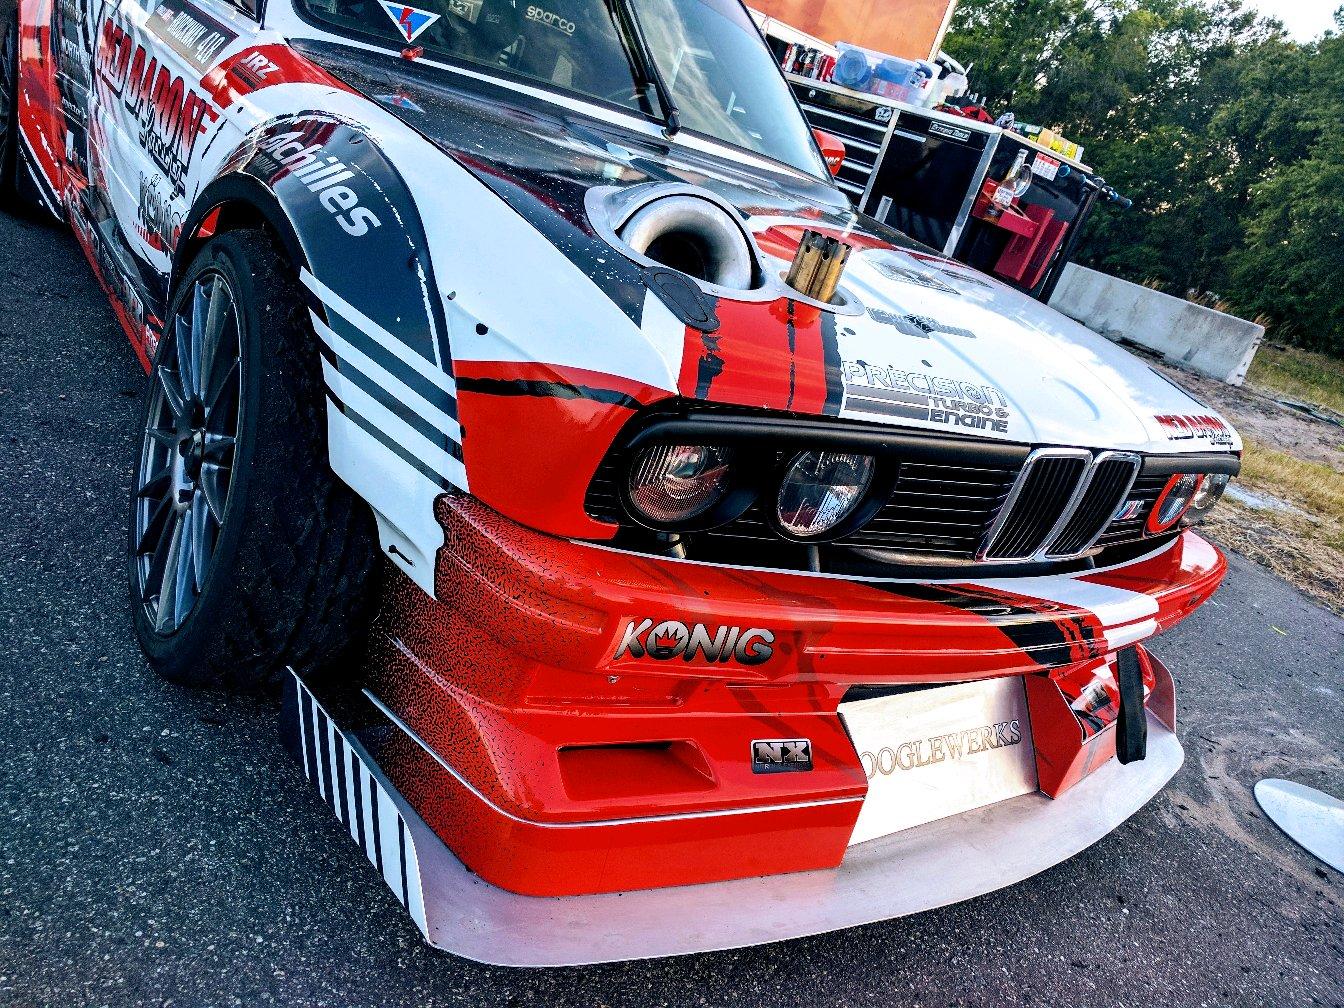 Some Gorgeous Turbo Drift Car Wallpaper From Formula Drift